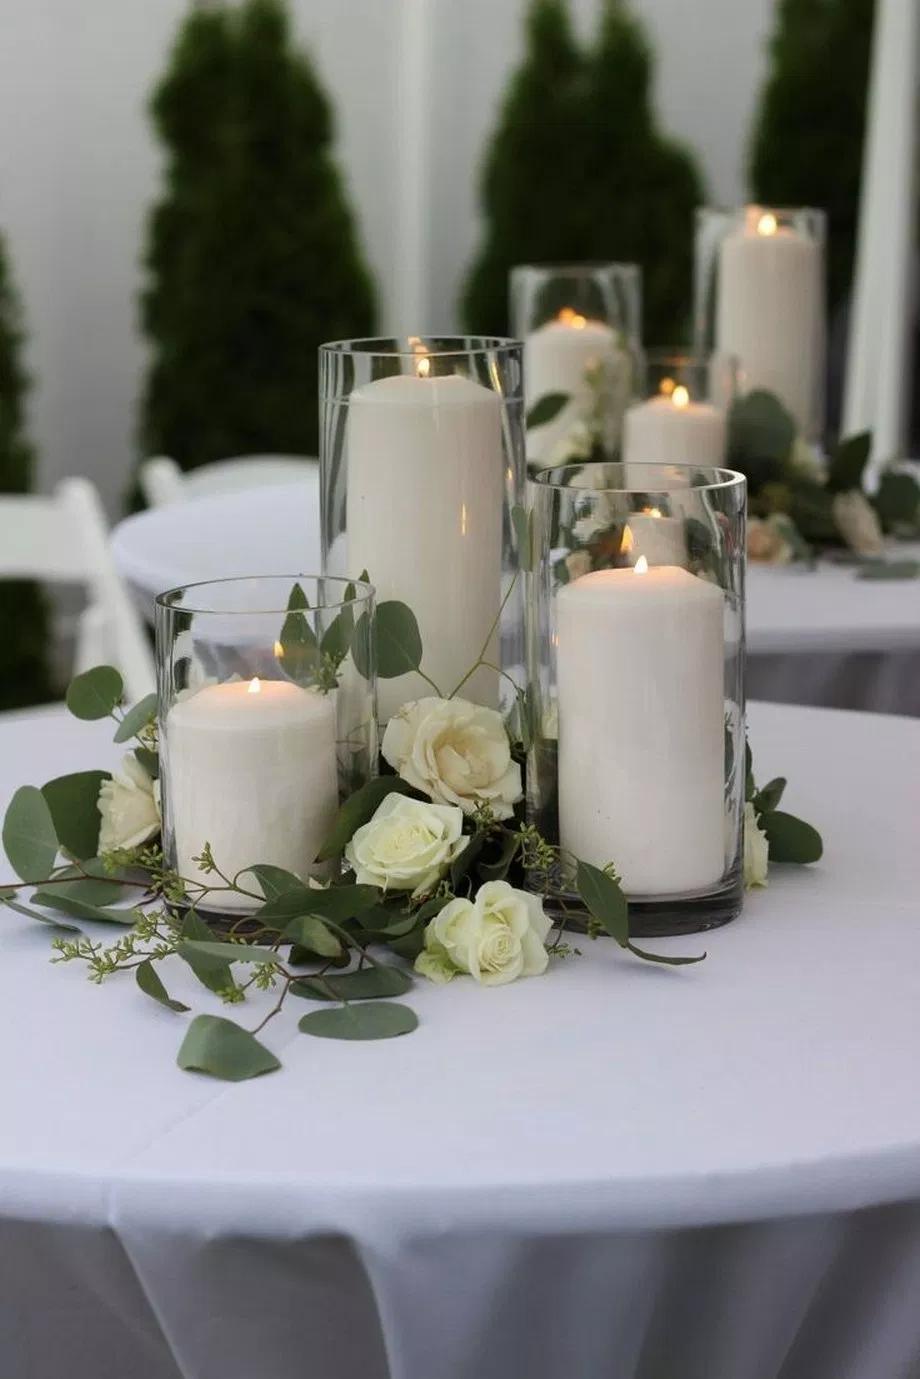 29 Pastel Green & White Wedding Decoration Ideas #weddingdecoration » tendollarbux.com #whiteweddingflowers